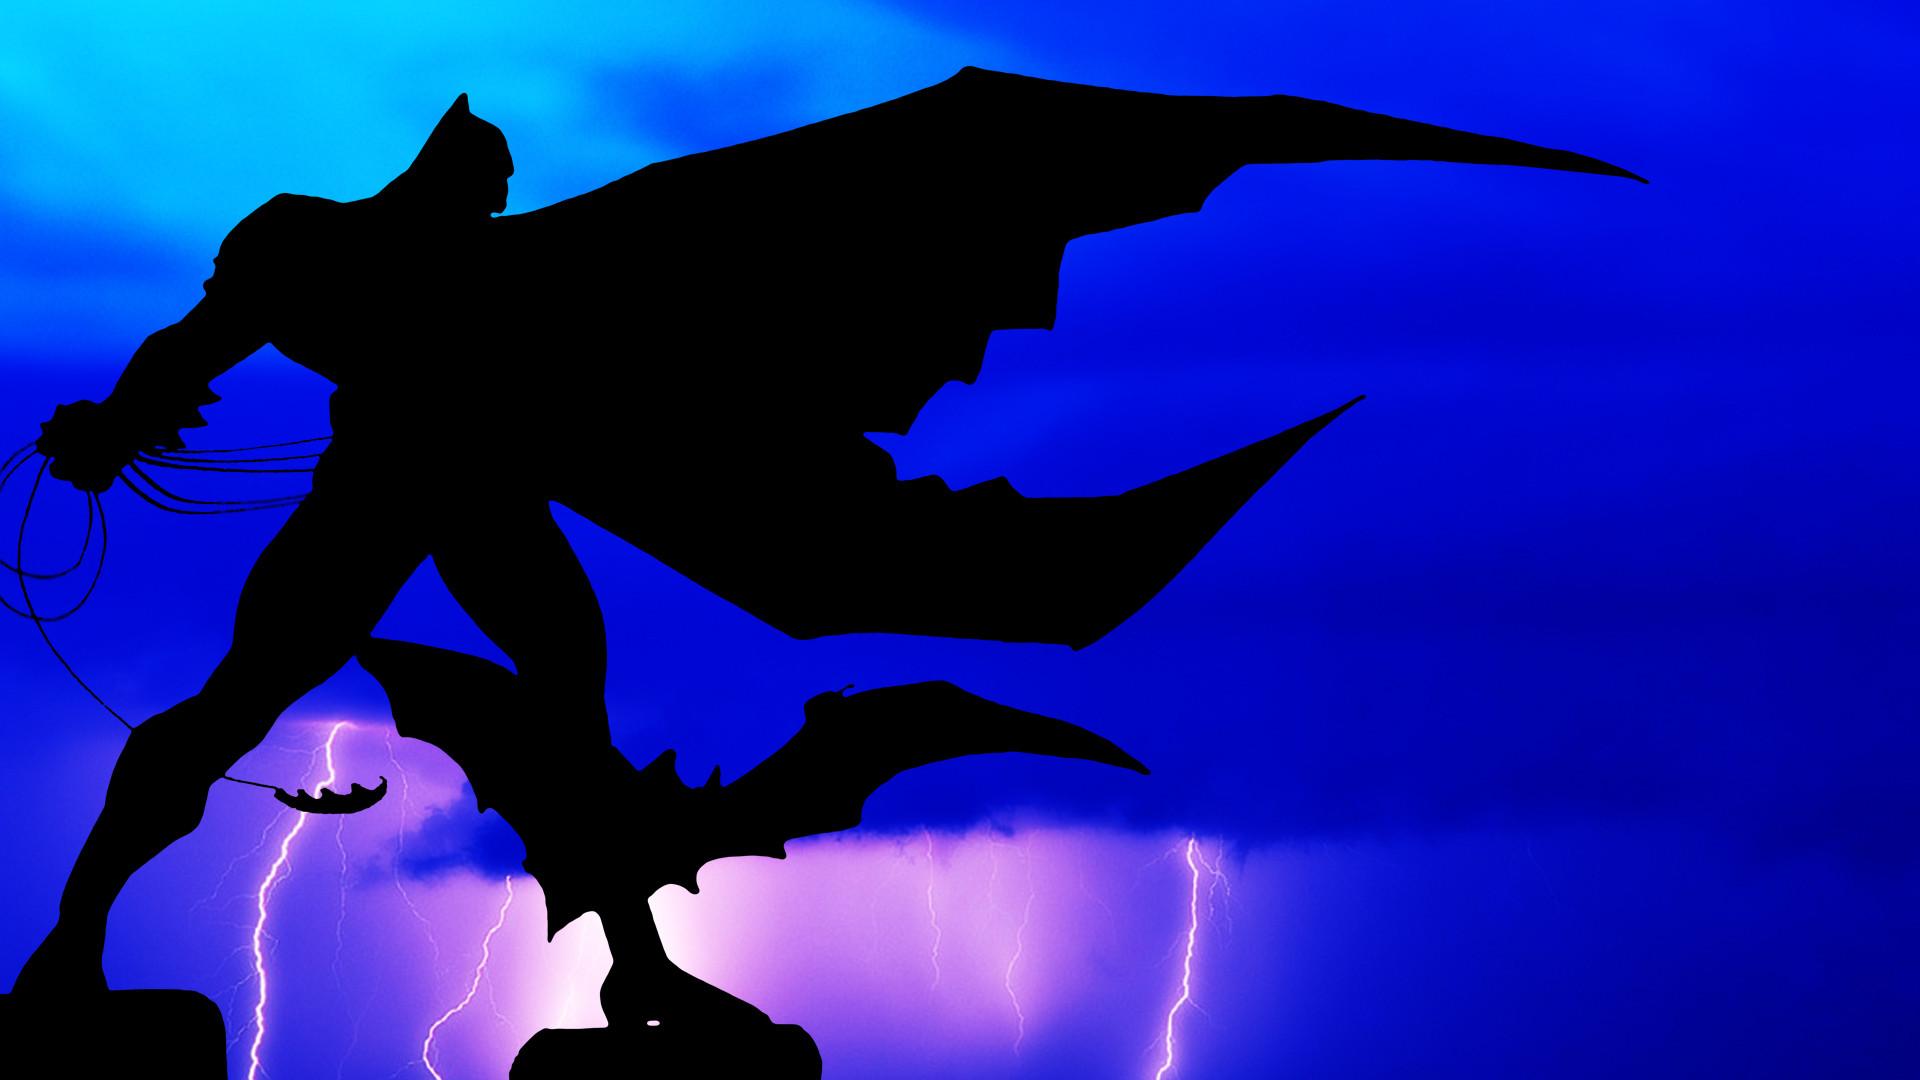 The Dark Knight Returns Wallpaper By Rollingtombstone On Deviantart